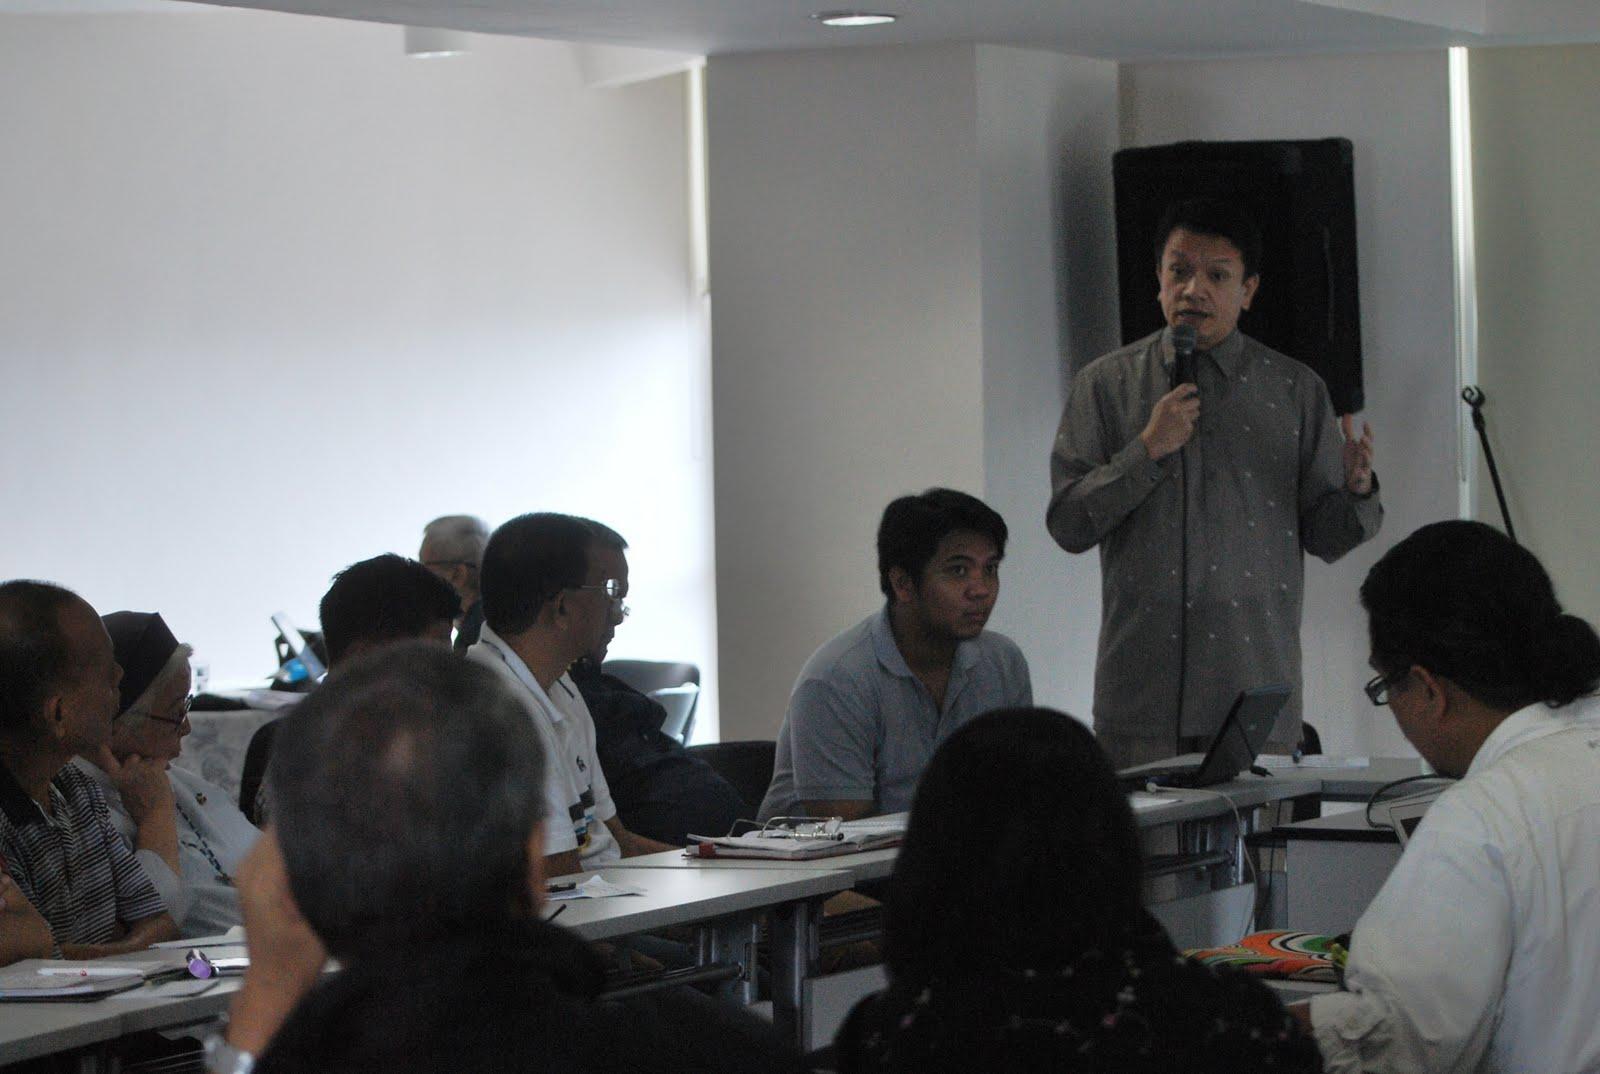 http://3.bp.blogspot.com/-XDJ_xGcIp5o/TkOwYHmF9fI/AAAAAAAAJLA/7qZklrTygTg/s1600/CSO+representatives+listens+to+Panel+Chair+Alexander+Padilla+during+a+meeting+Quezon+City2.JPG